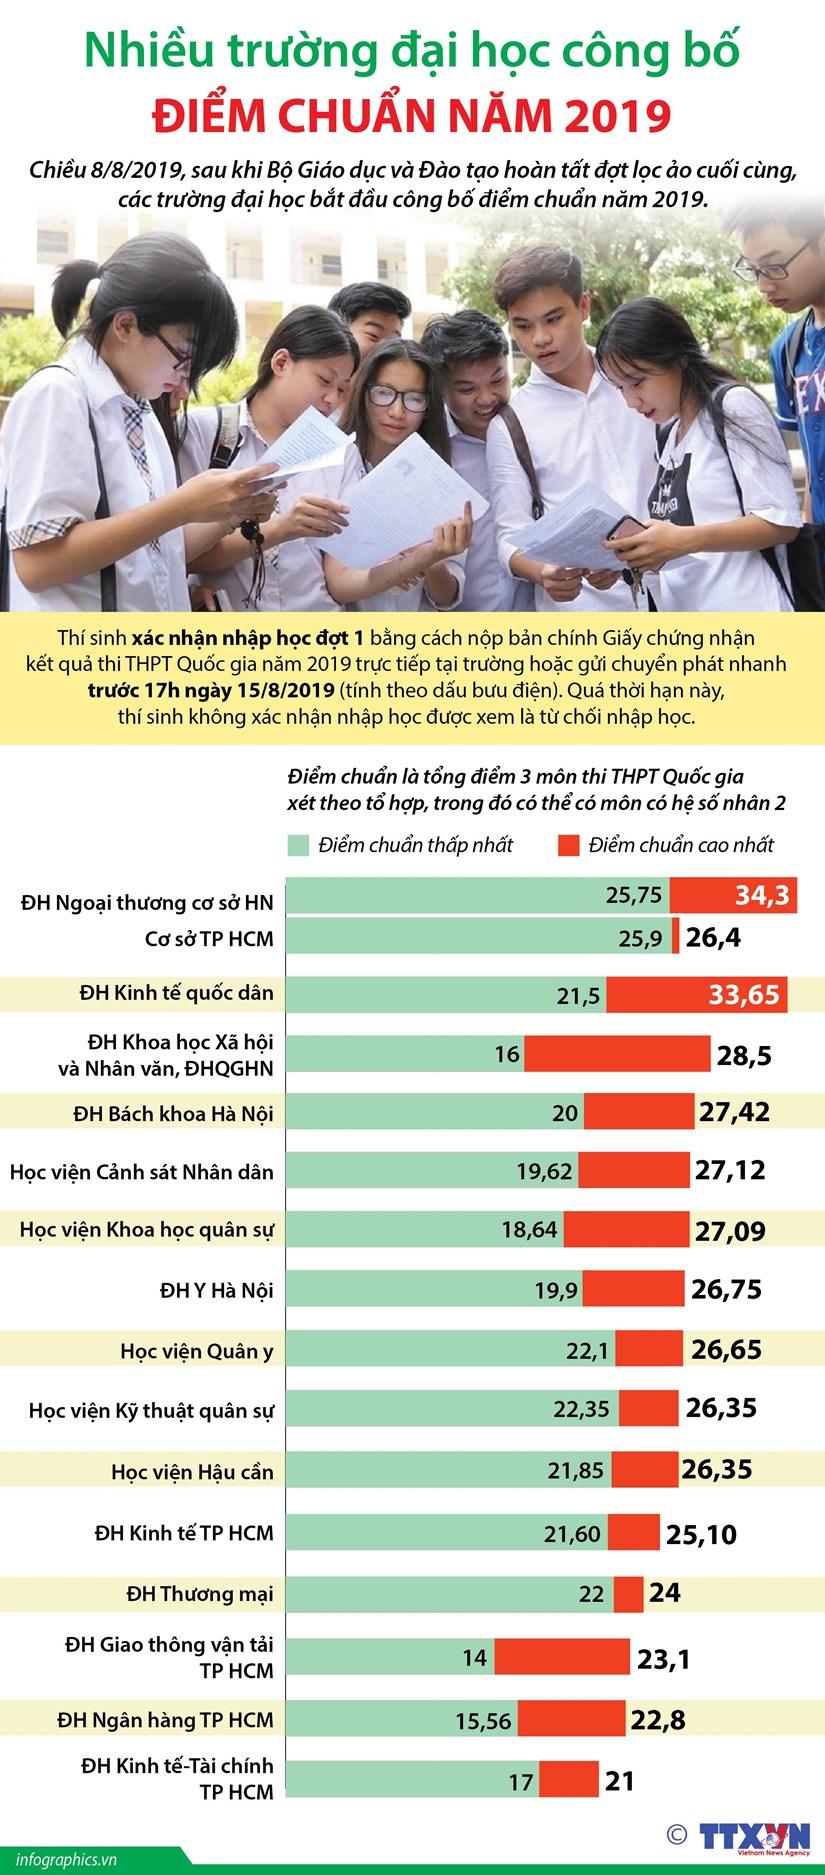 [Infographics] Nhieu truong dai hoc cong bo diem chuan nam 2019 hinh anh 1